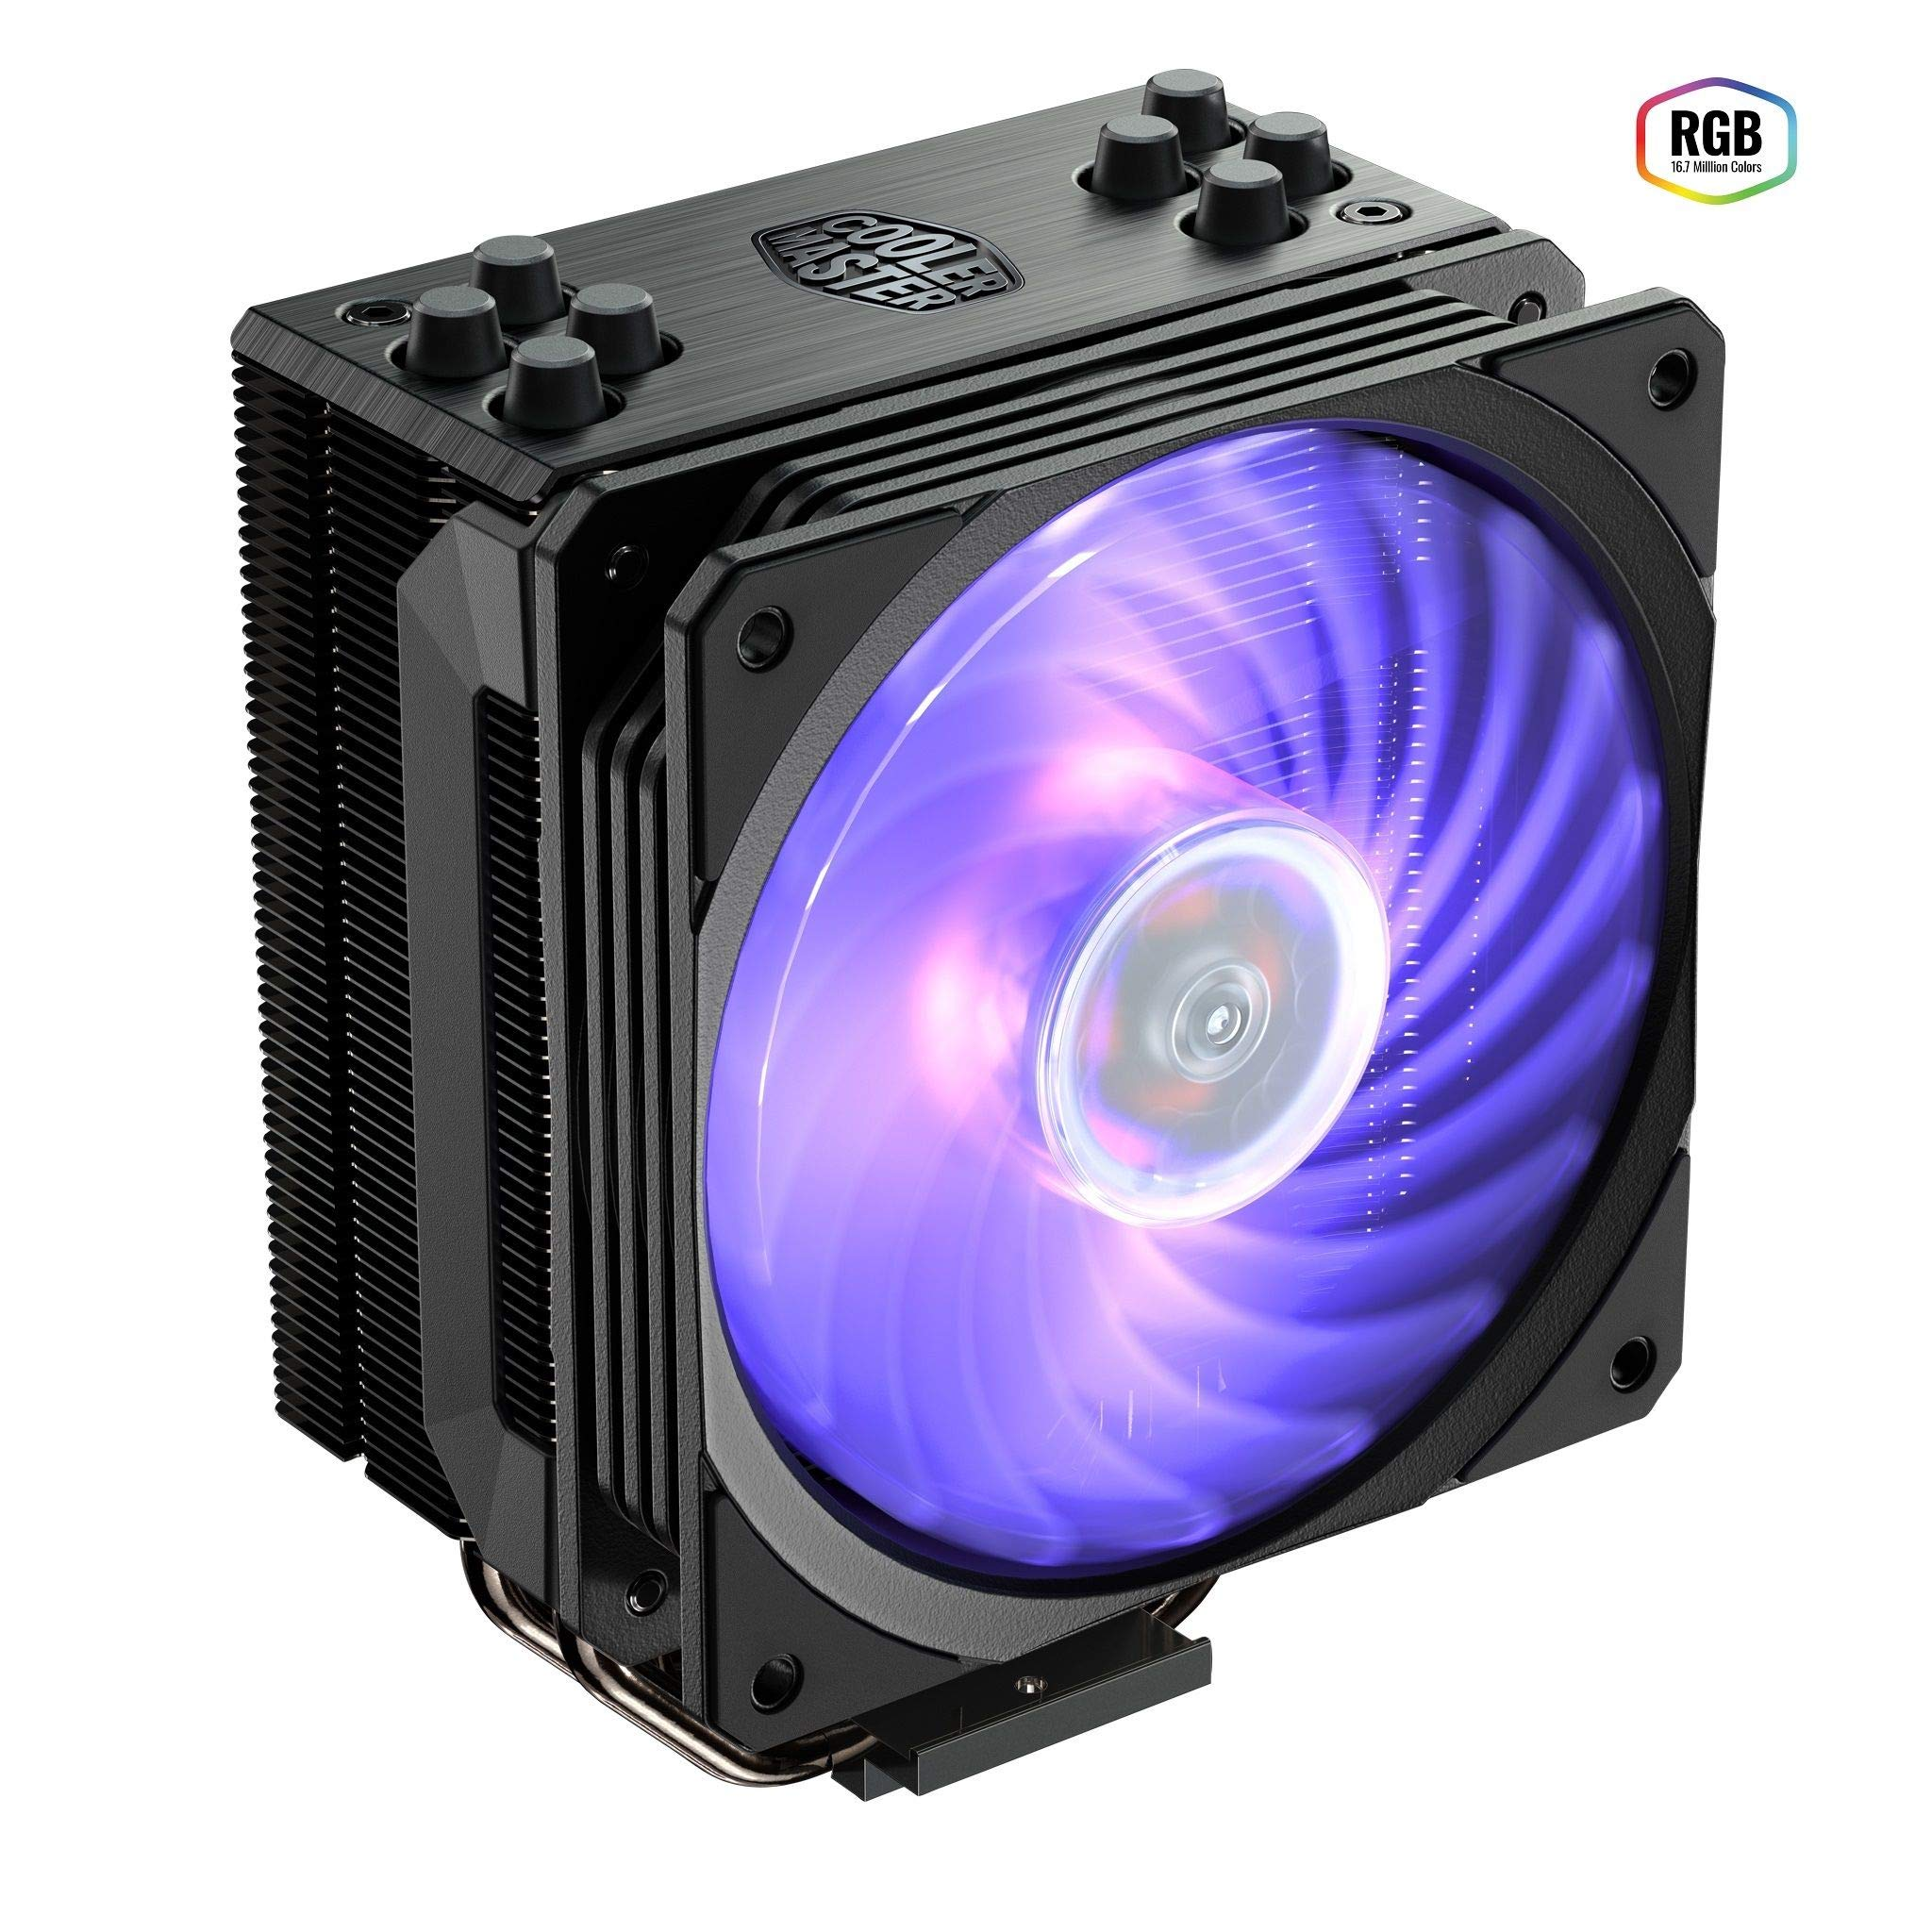 Cooler Master Hyper 212 RGB Black Edition CPU Cooling System by Cooler Master